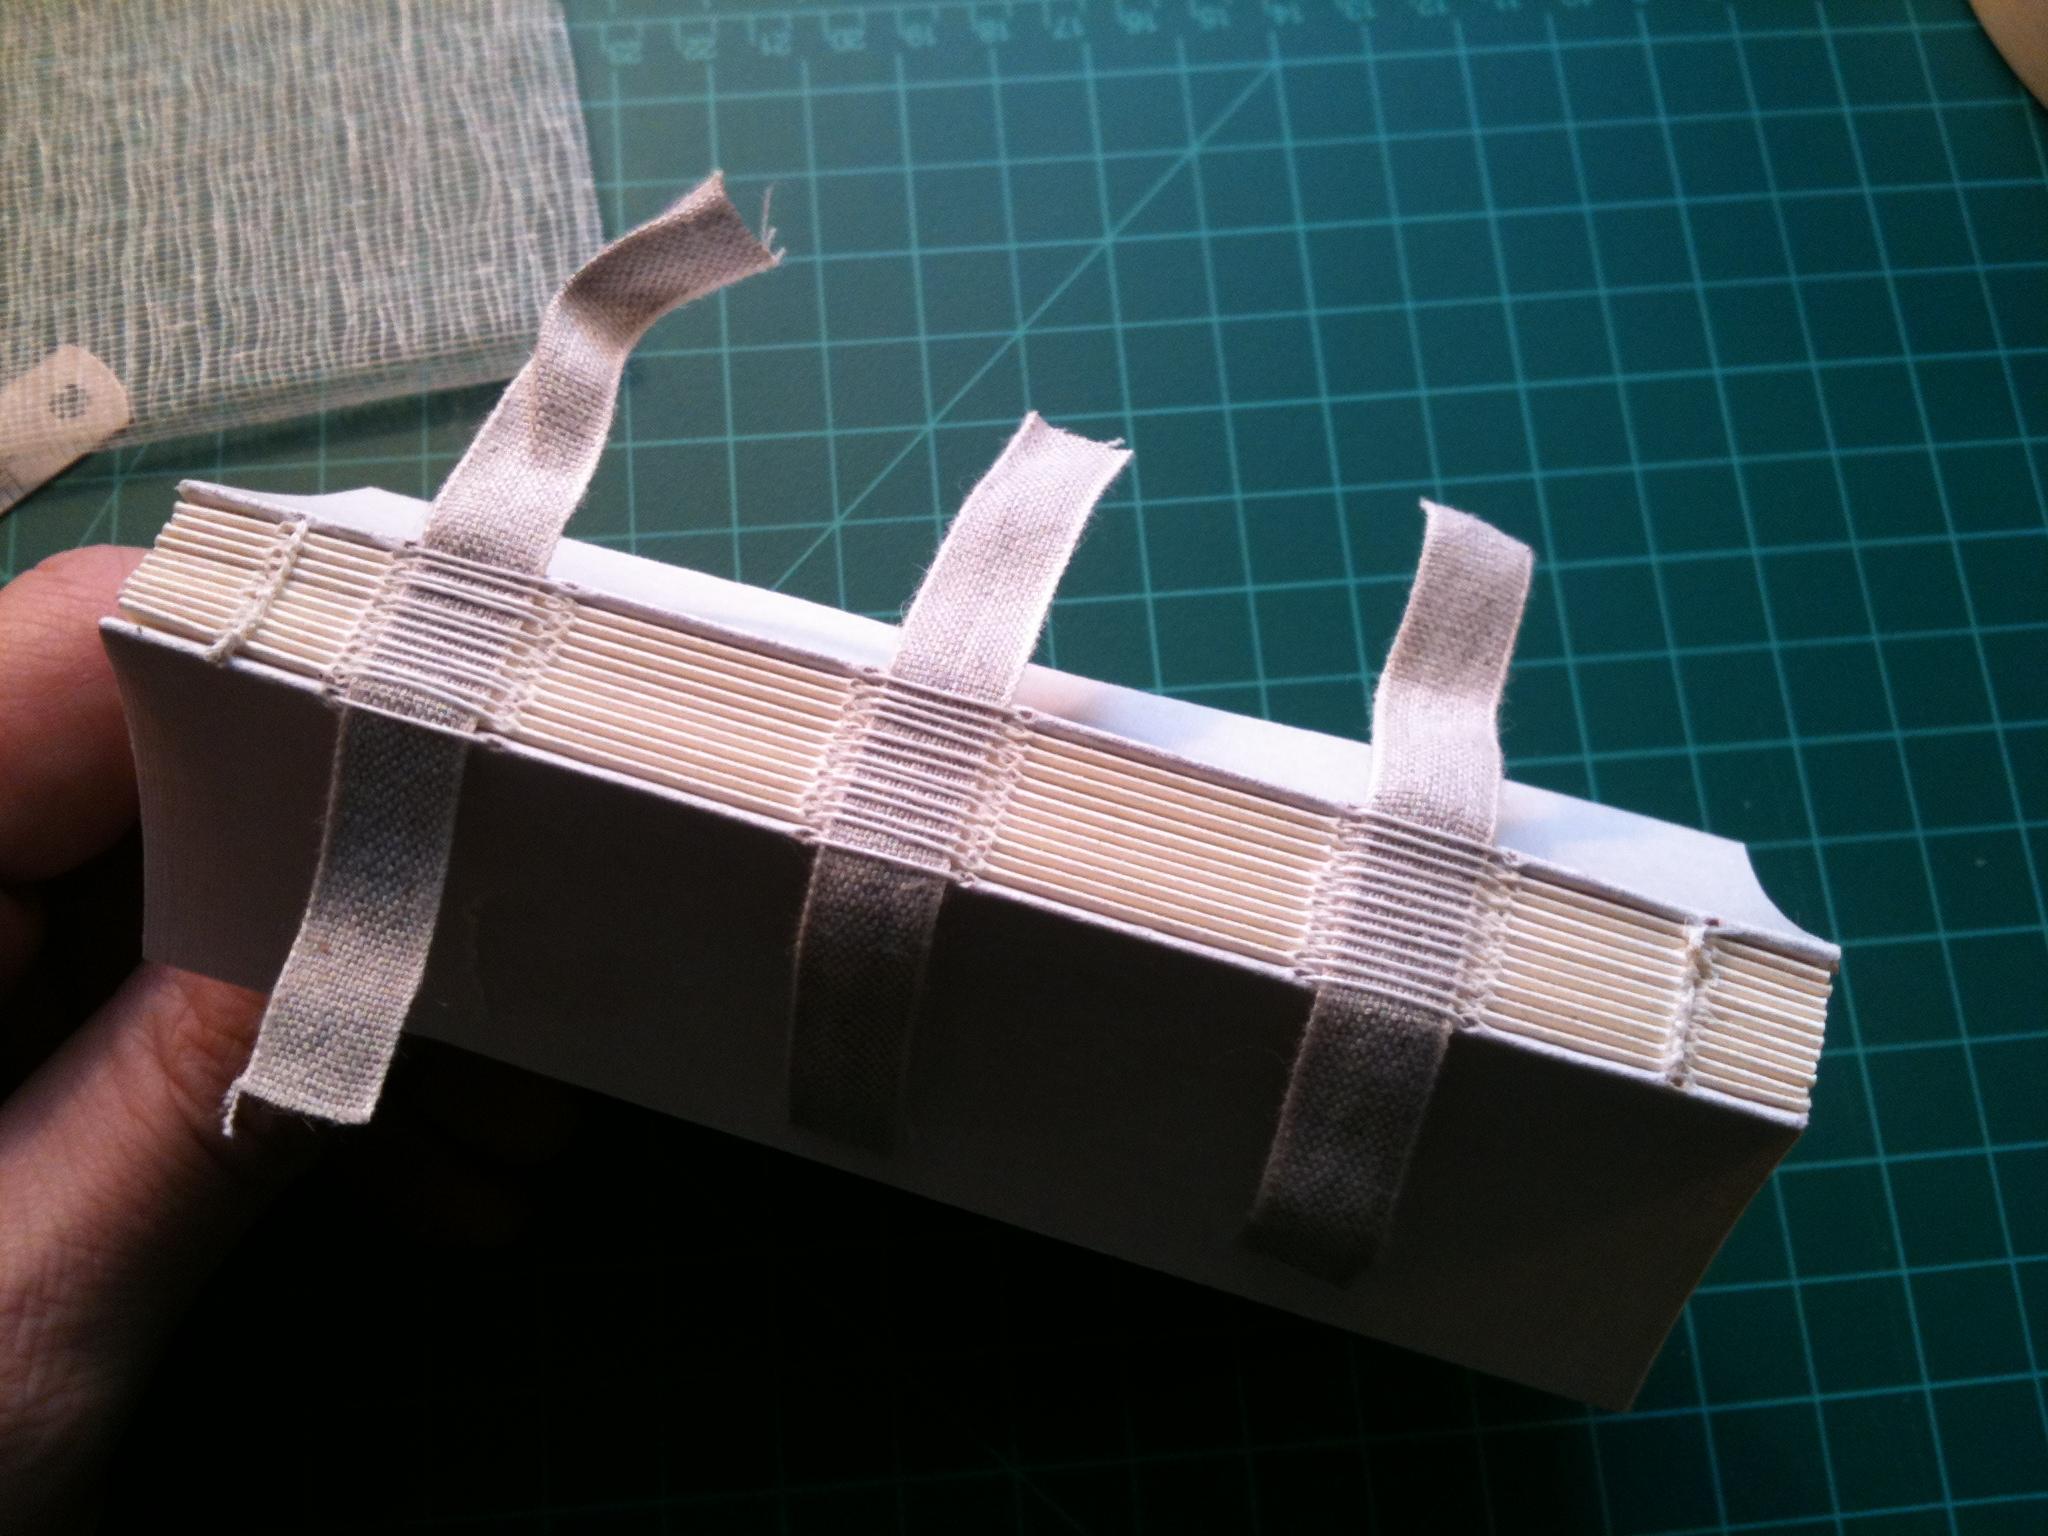 20111205-bookbinding-IMG_0444.JPG